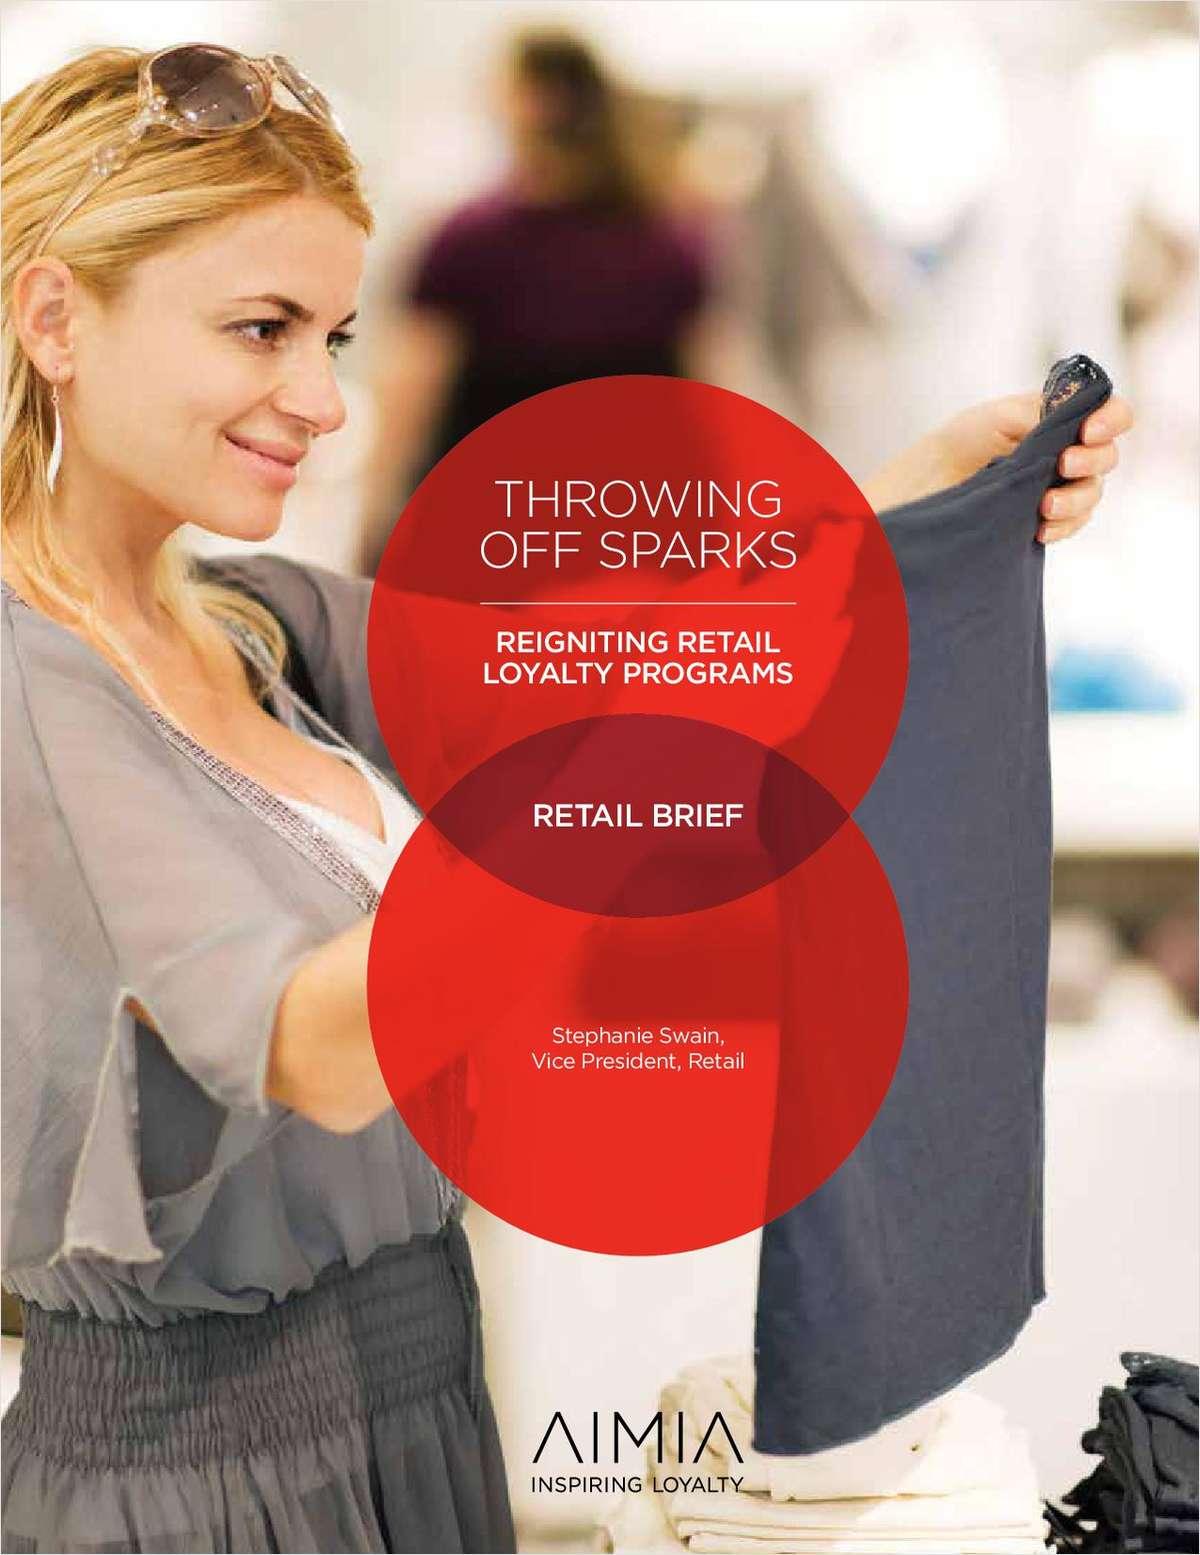 Reigniting Retail Loyalty Programs